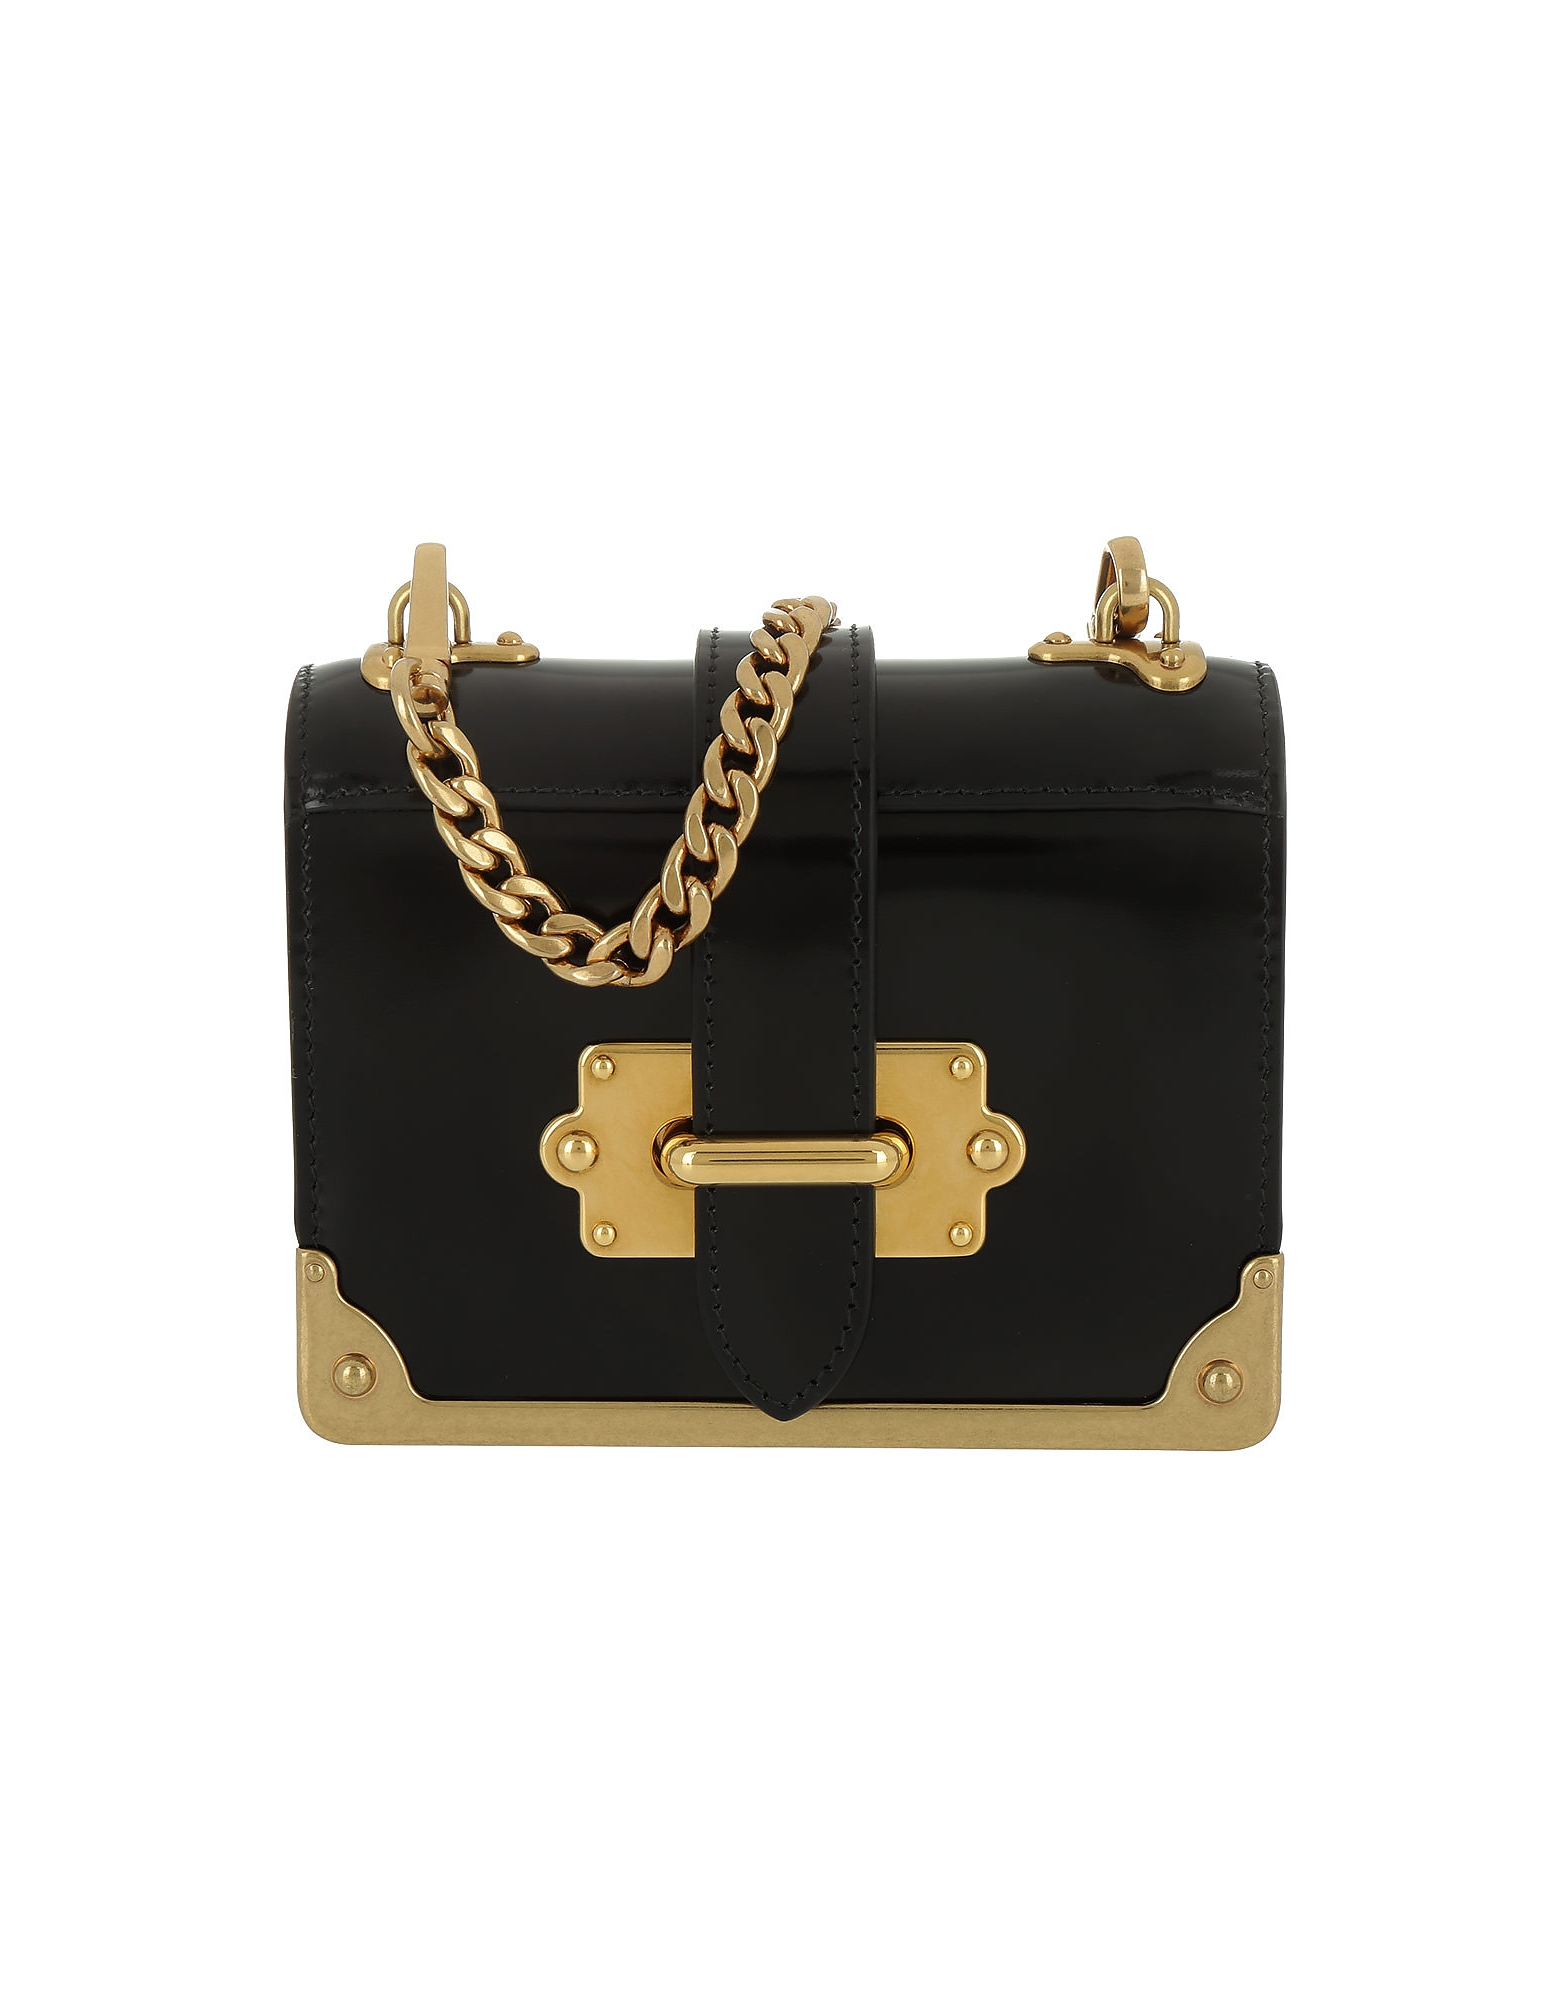 Prada Handbags, Micro Cahier Bag Black